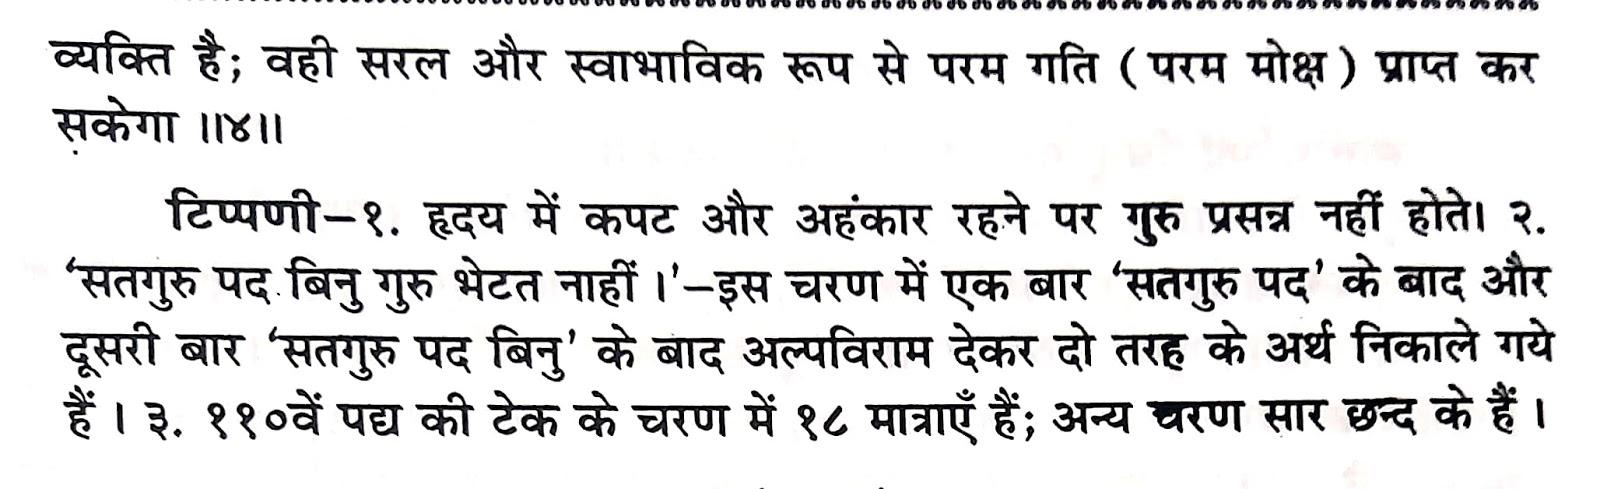 "P110, Who is the luckiest in the world ""सतगुरु पद बिनु गुरु भेटत नाहीं।..."" महर्षि मेंहीं पदावली अर्थ सहित। पदावली भजन 110 का टिप्पणी"